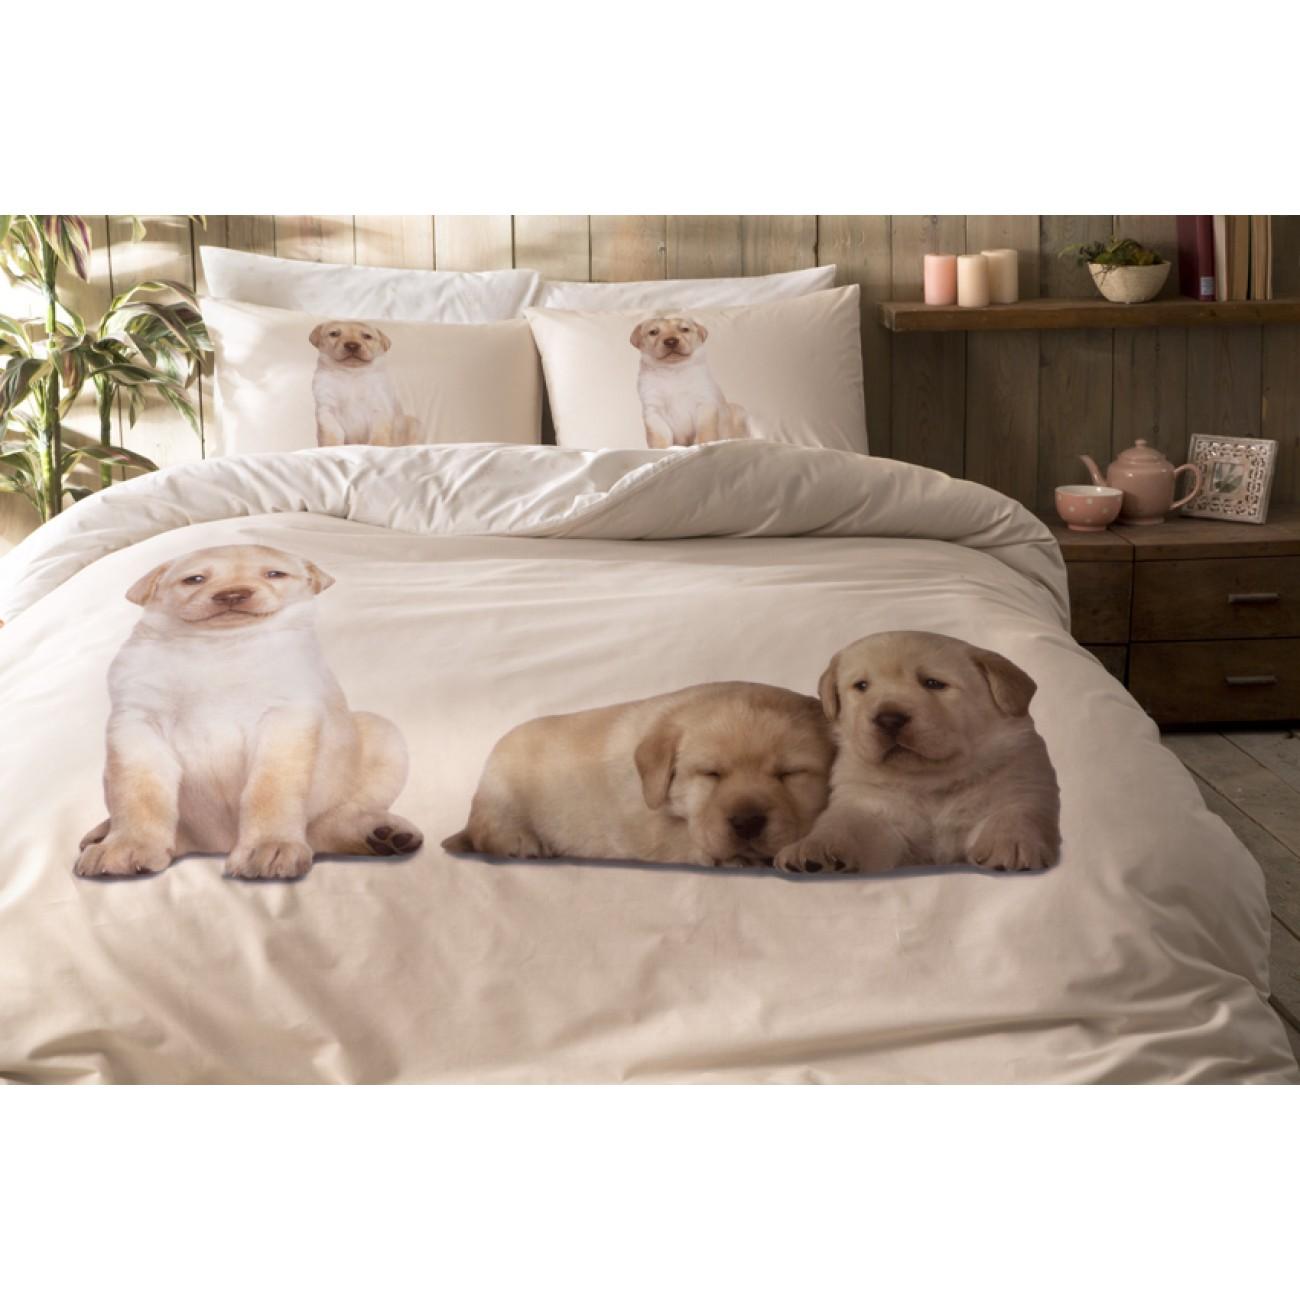 renforc baumwolletac dogs 160x220 bettw sche. Black Bedroom Furniture Sets. Home Design Ideas